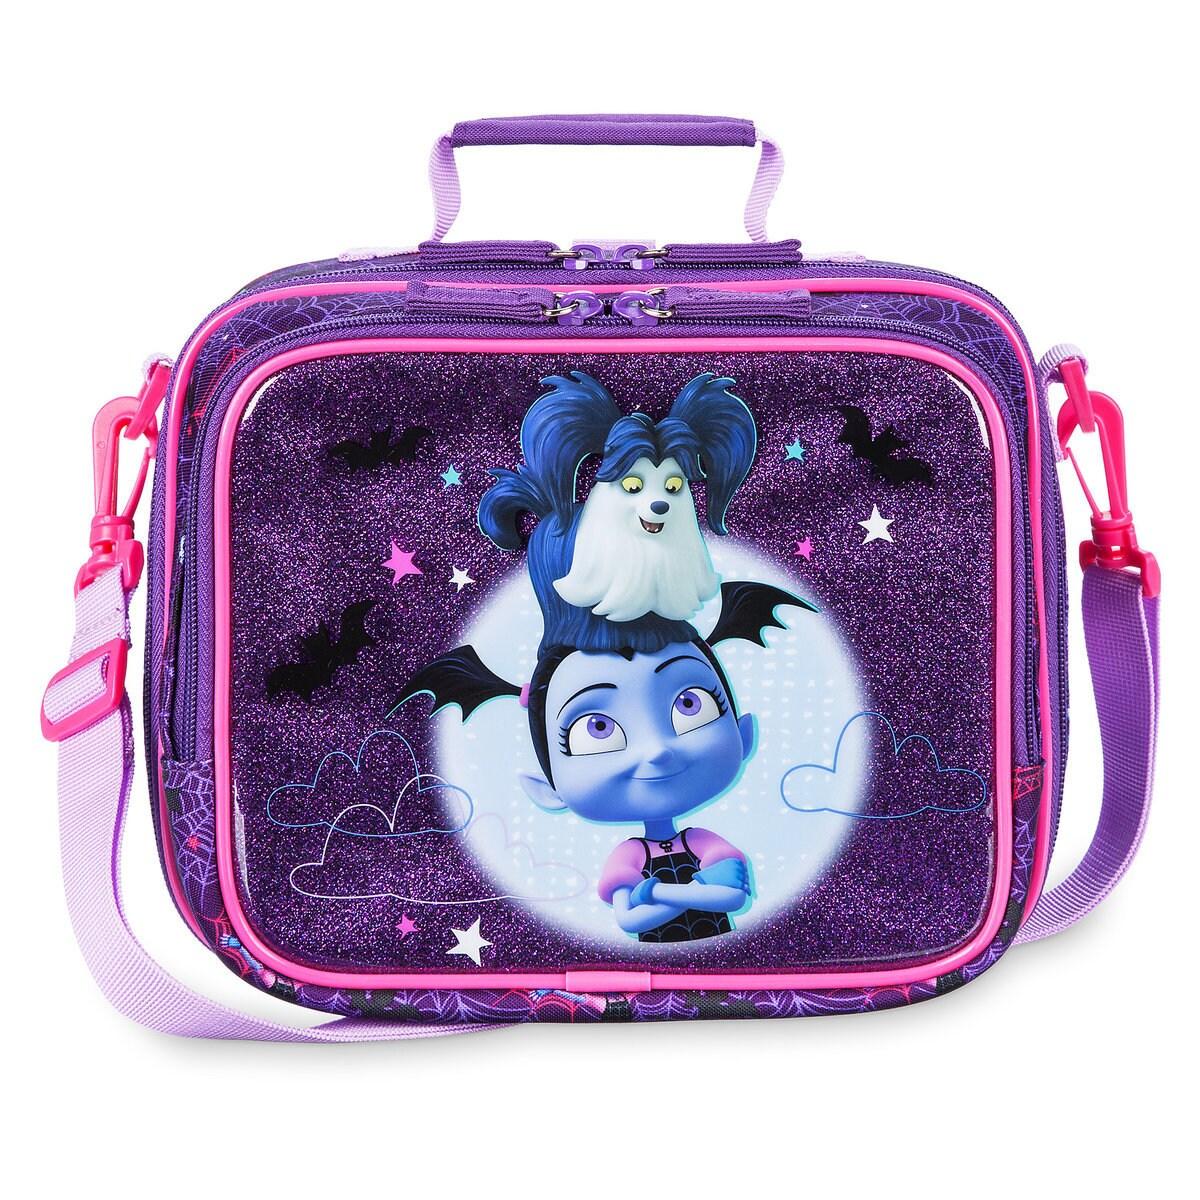 7978651fc38 Product Image of Vampirina Lunch Box   1